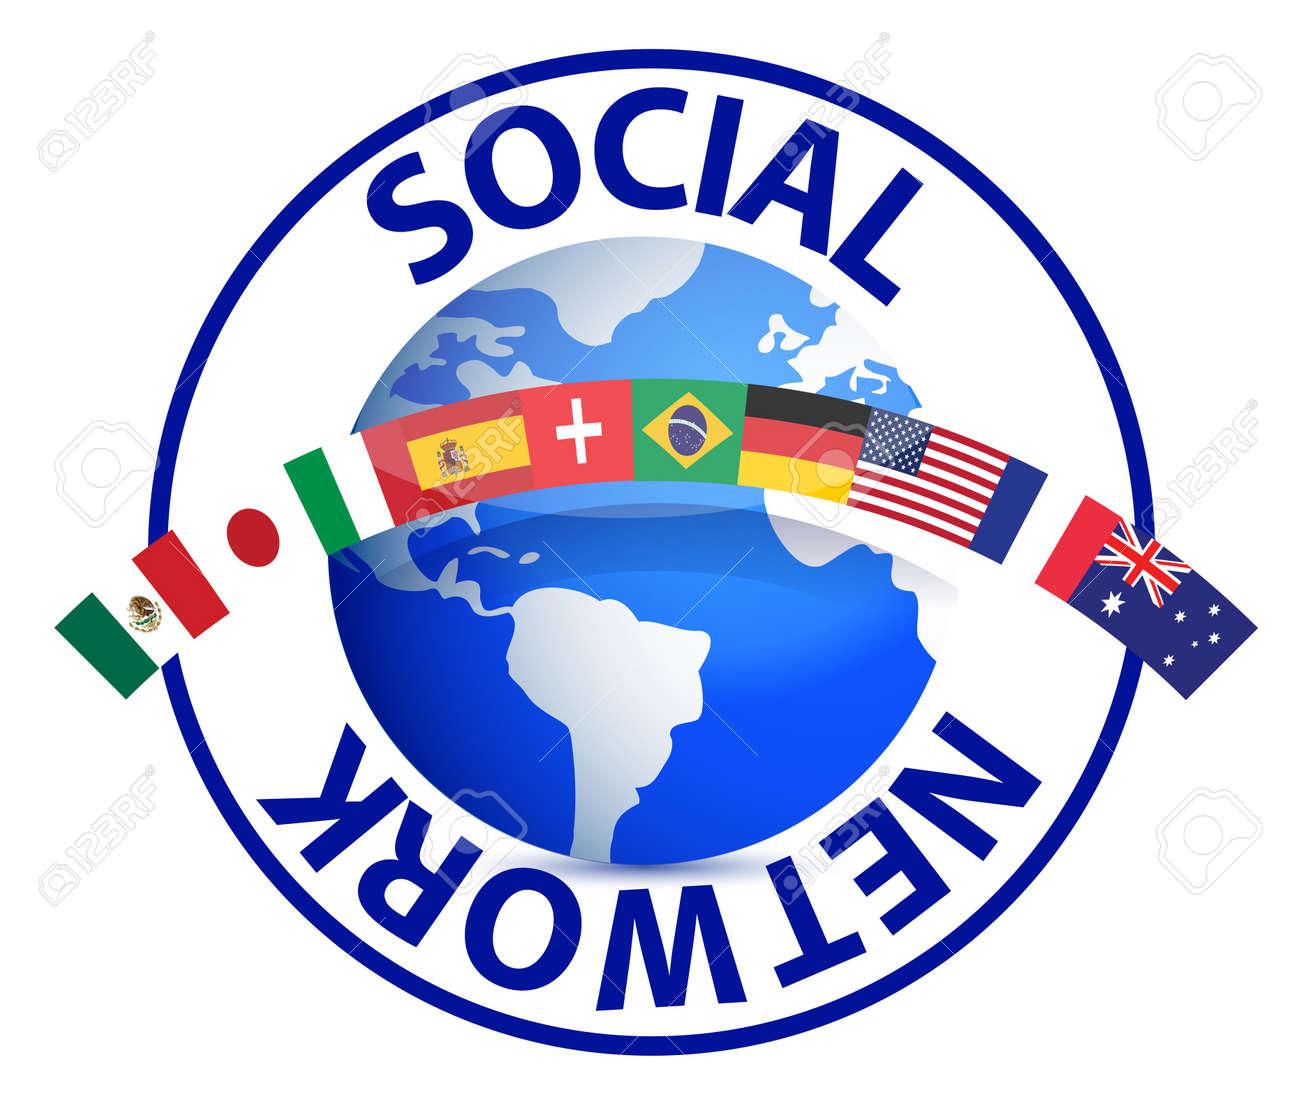 Social network text around earth globe illustration design on white Stock Vector - 12067159